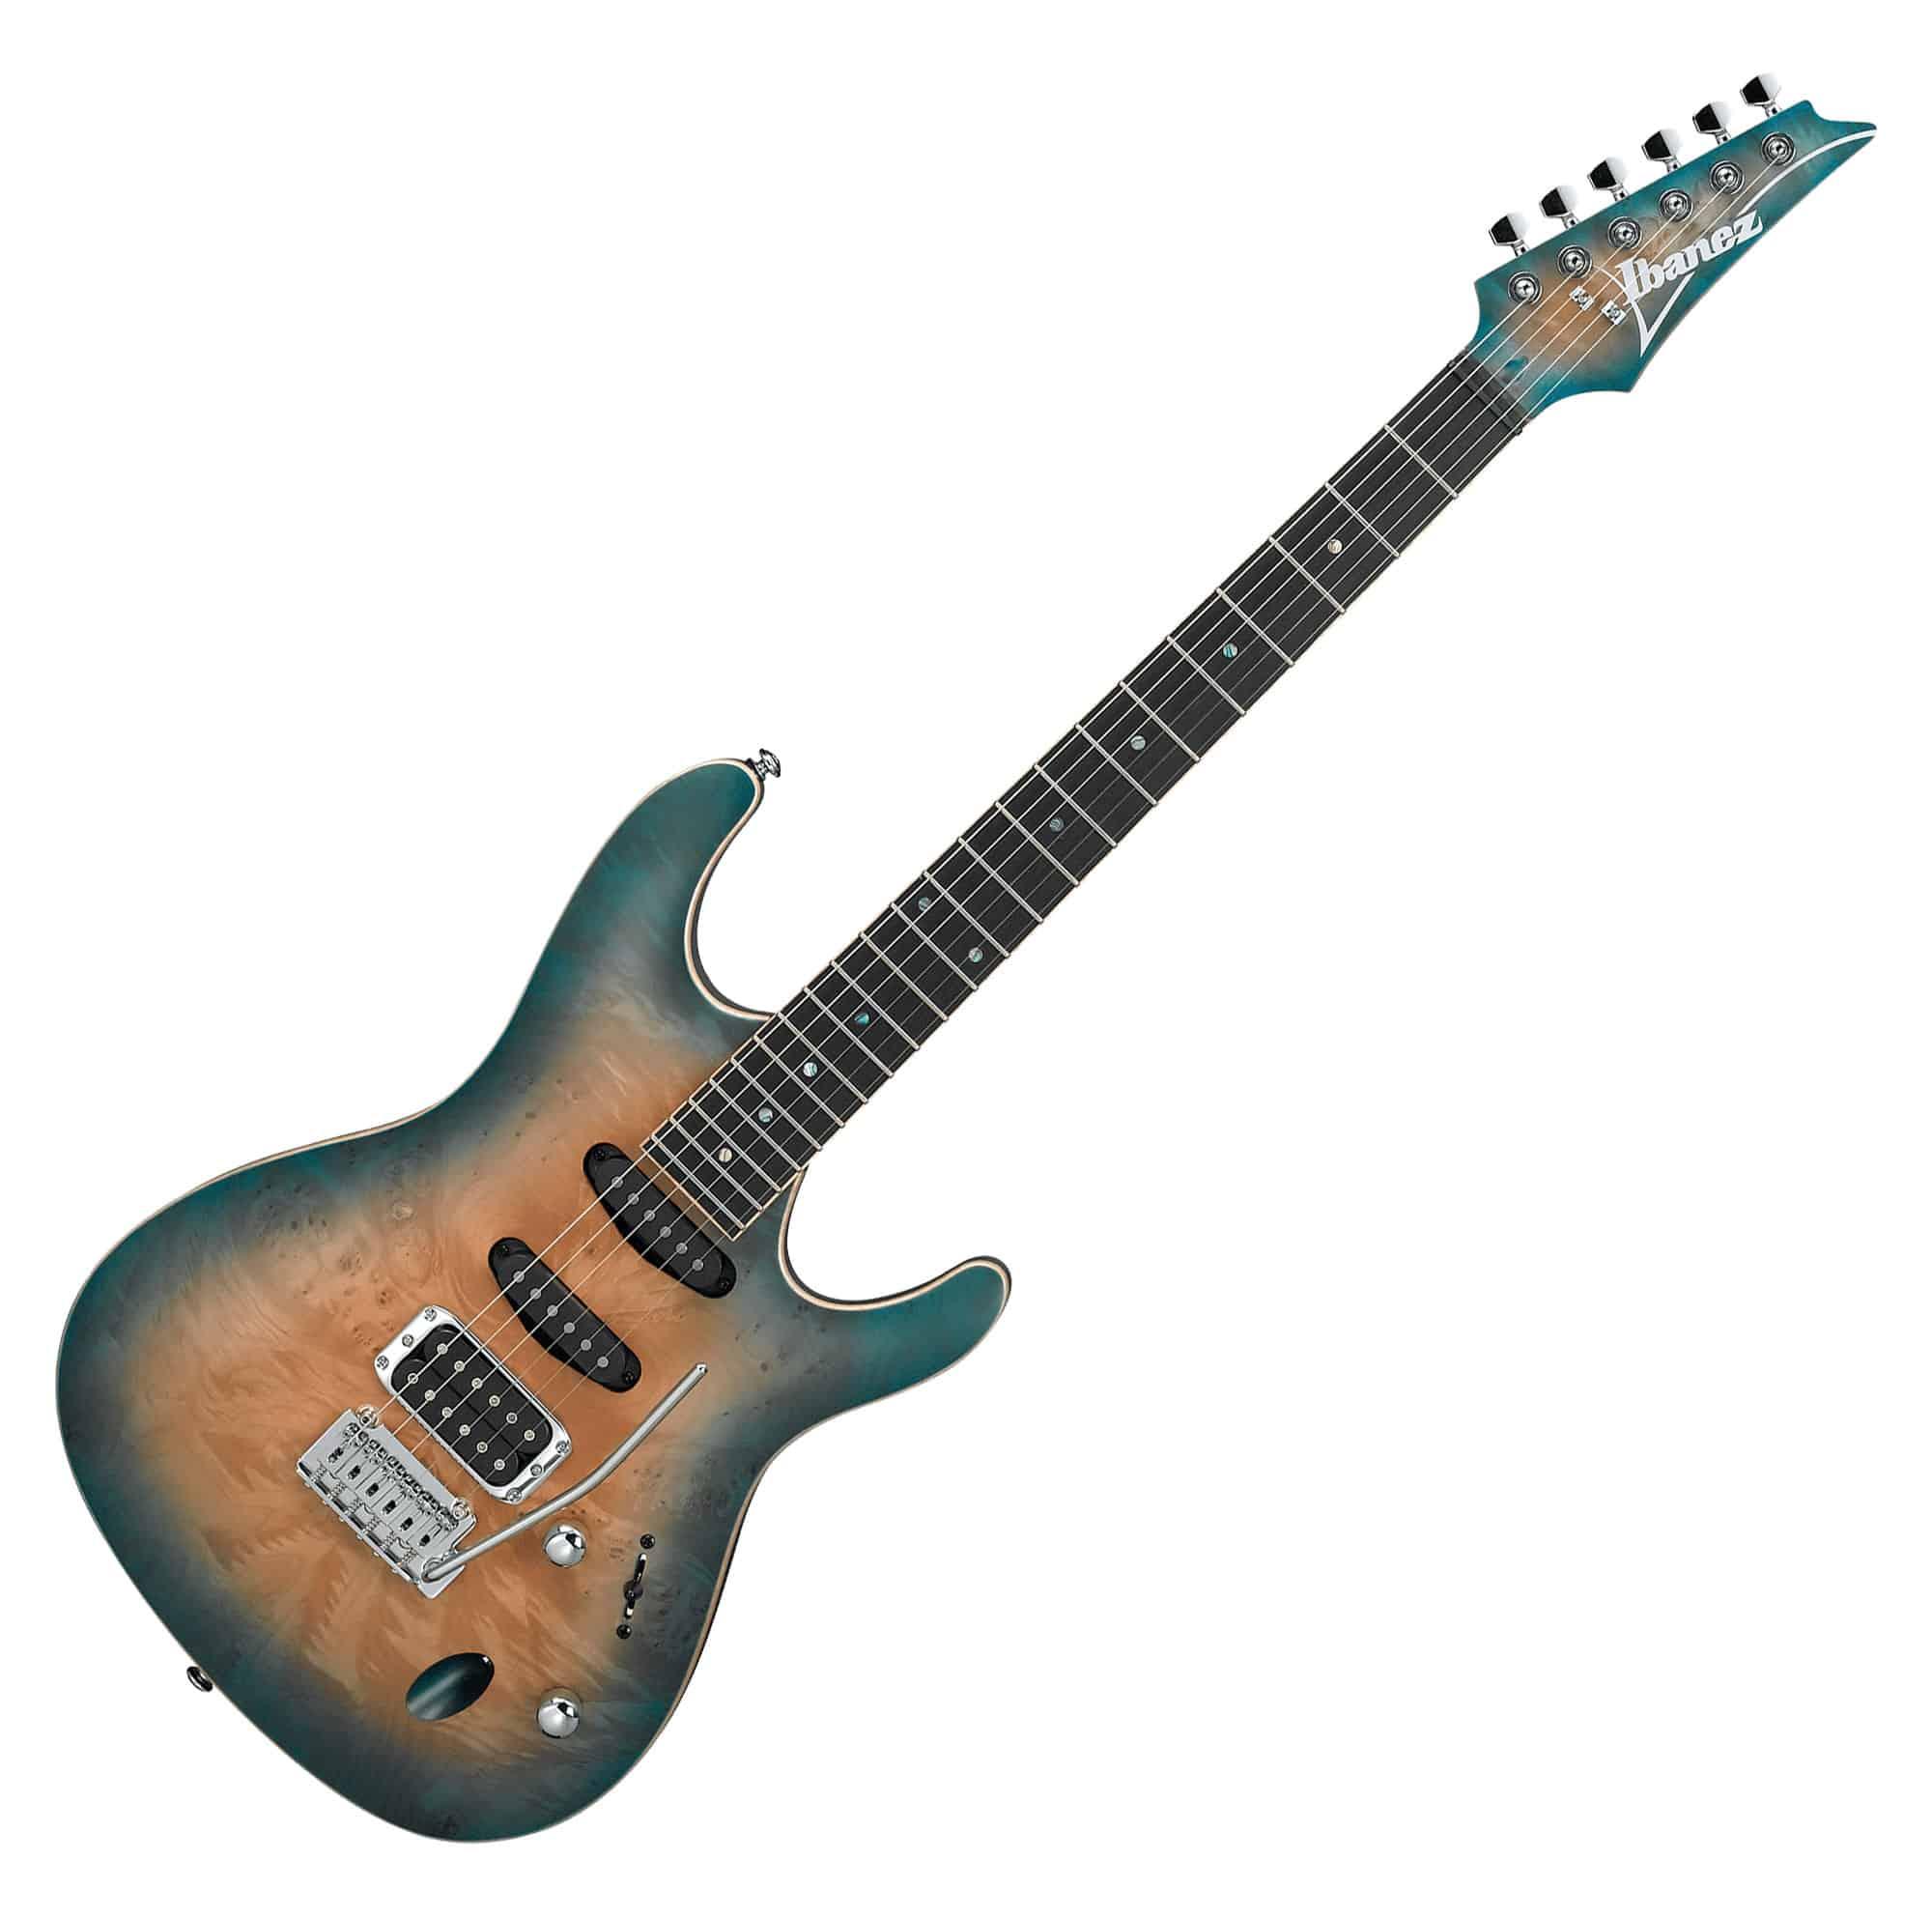 Egitarren - Ibanez SA460MBW SUB - Onlineshop Musikhaus Kirstein